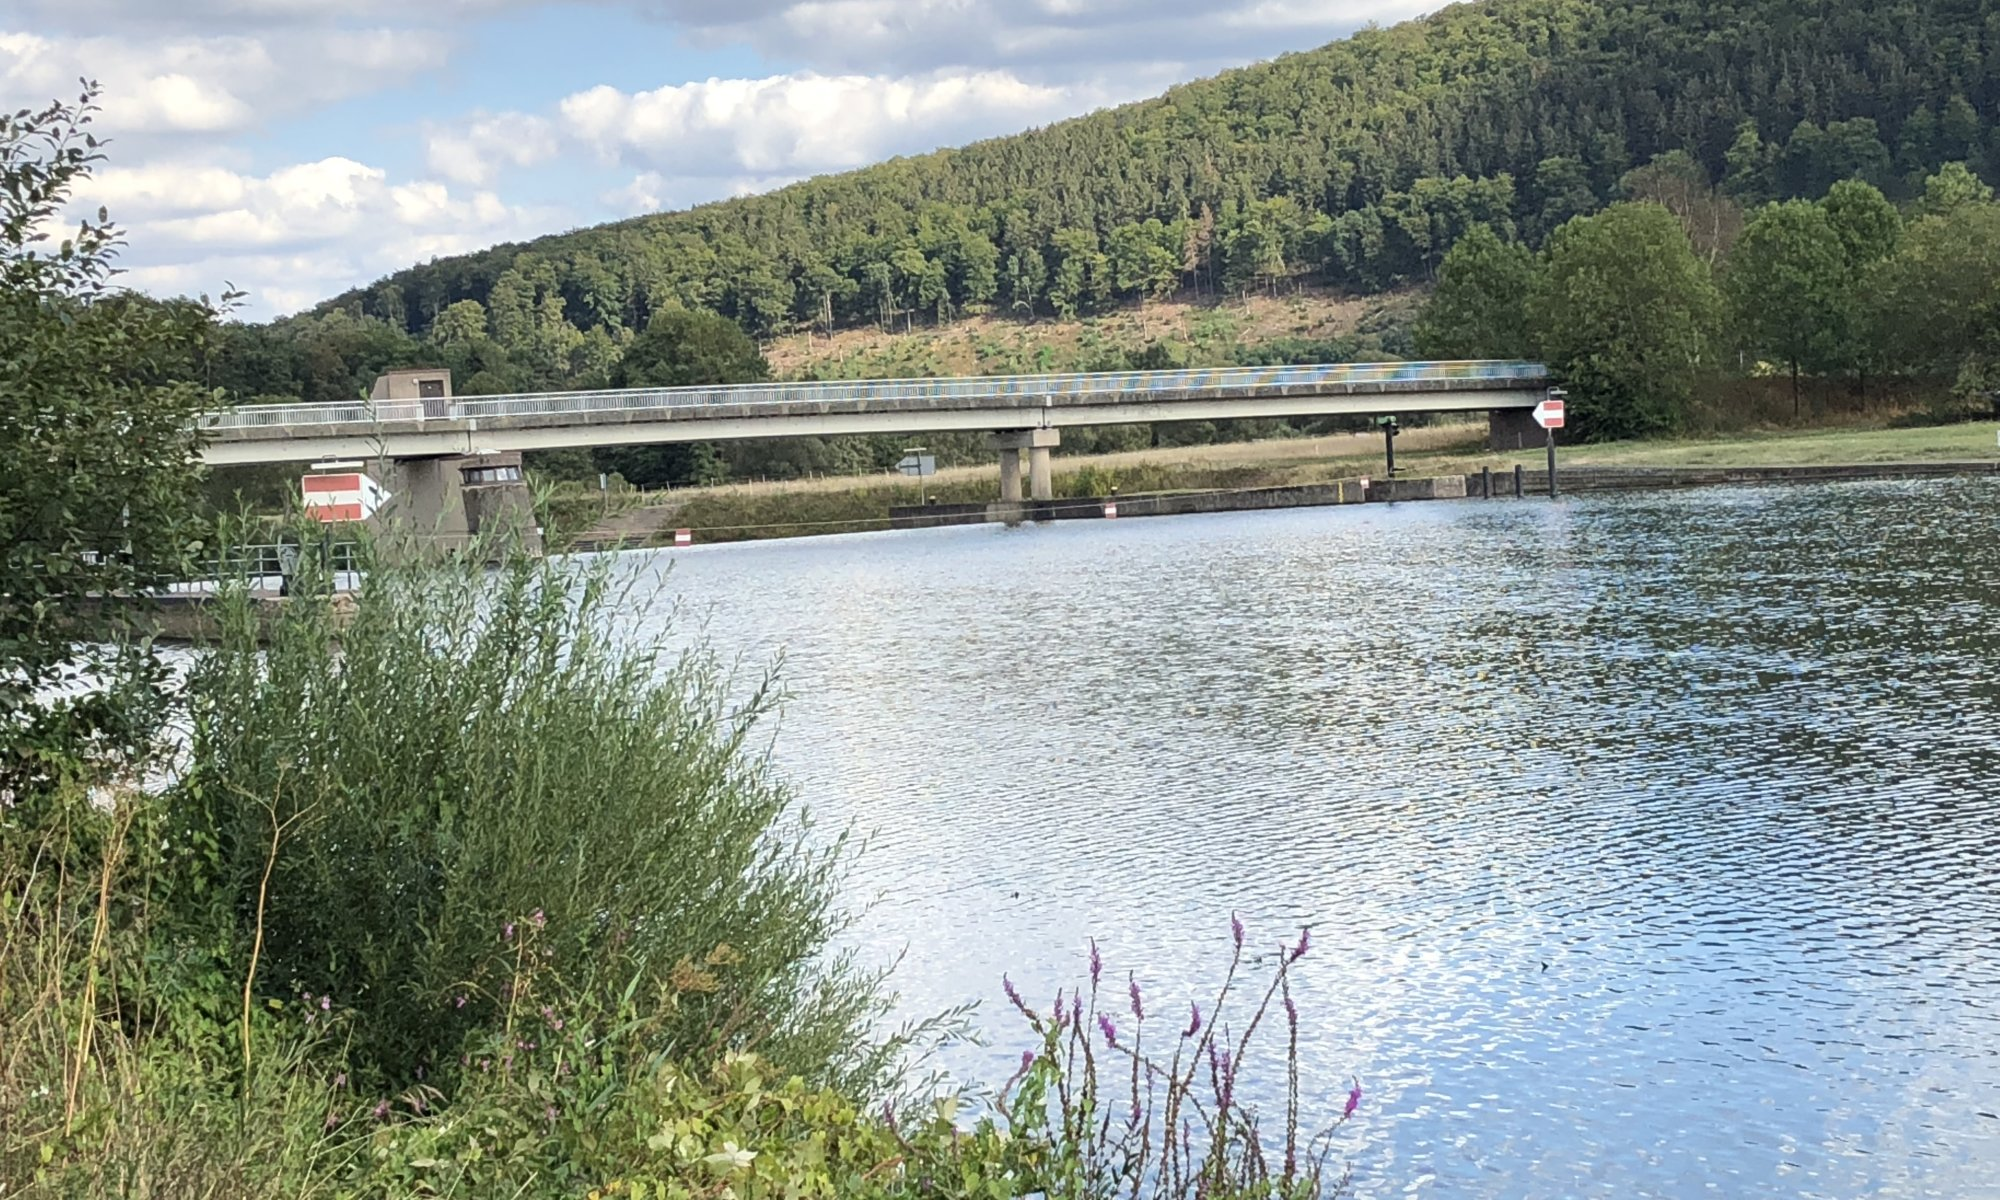 Fuldaschleuse, Wilhelmshausen, Fuldatal